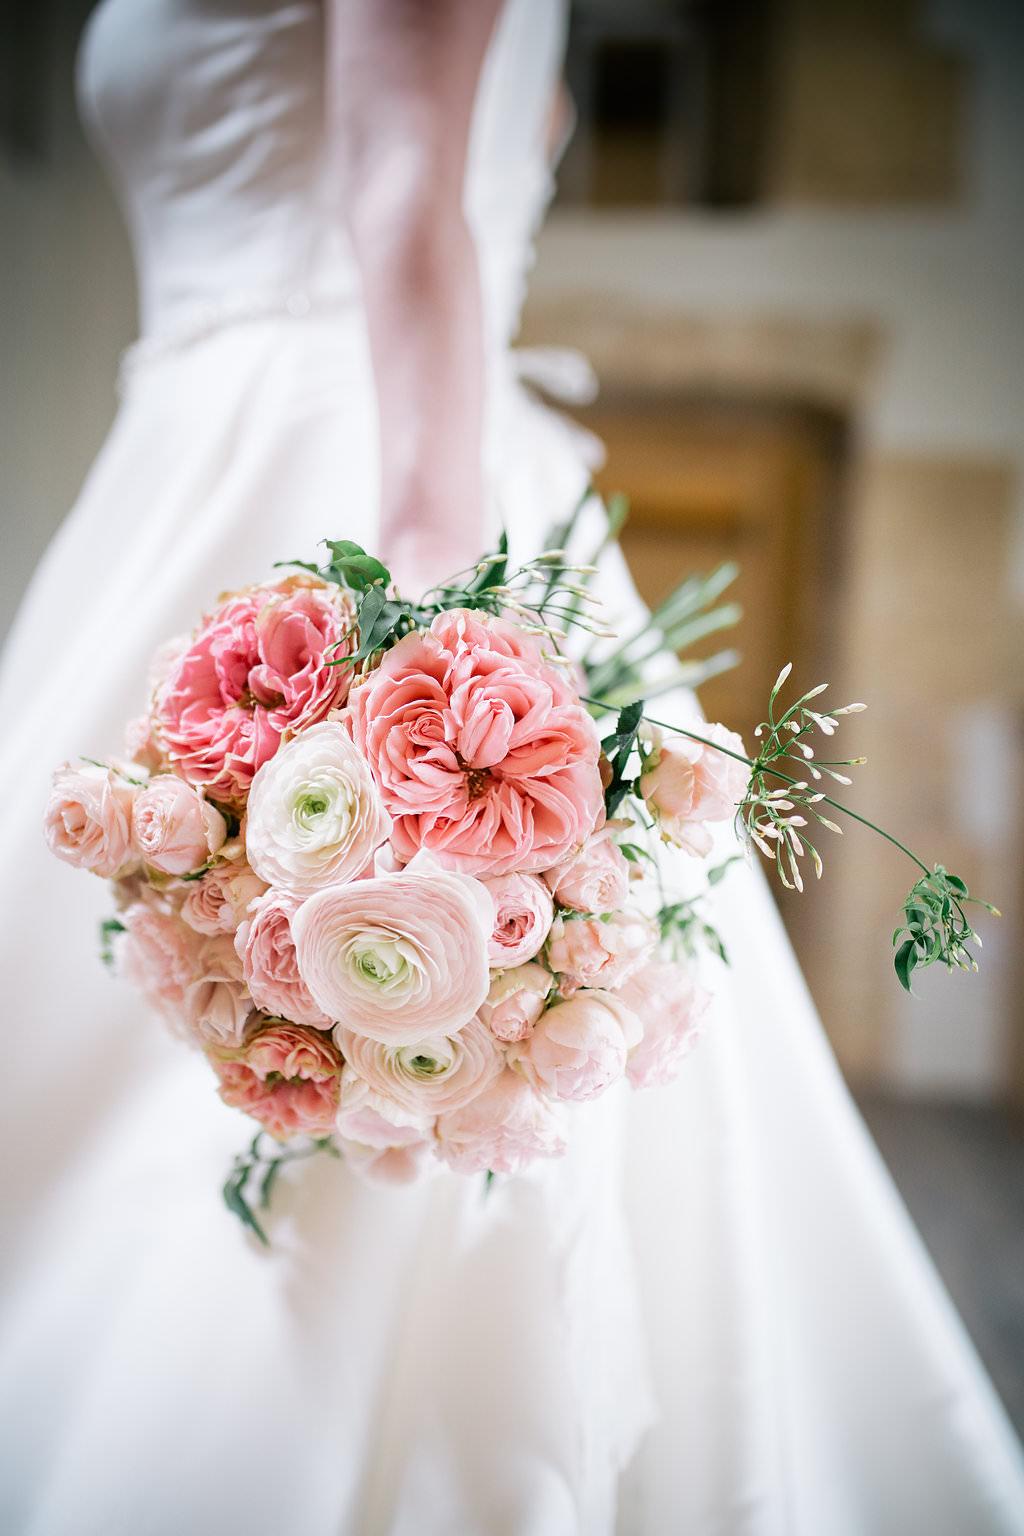 Bouquet Flowers Bride Bridal Pink Rose Ranunculus Peony Lapstone Barn Wedding Ideas Cotswolds Katie Hamilton Photography